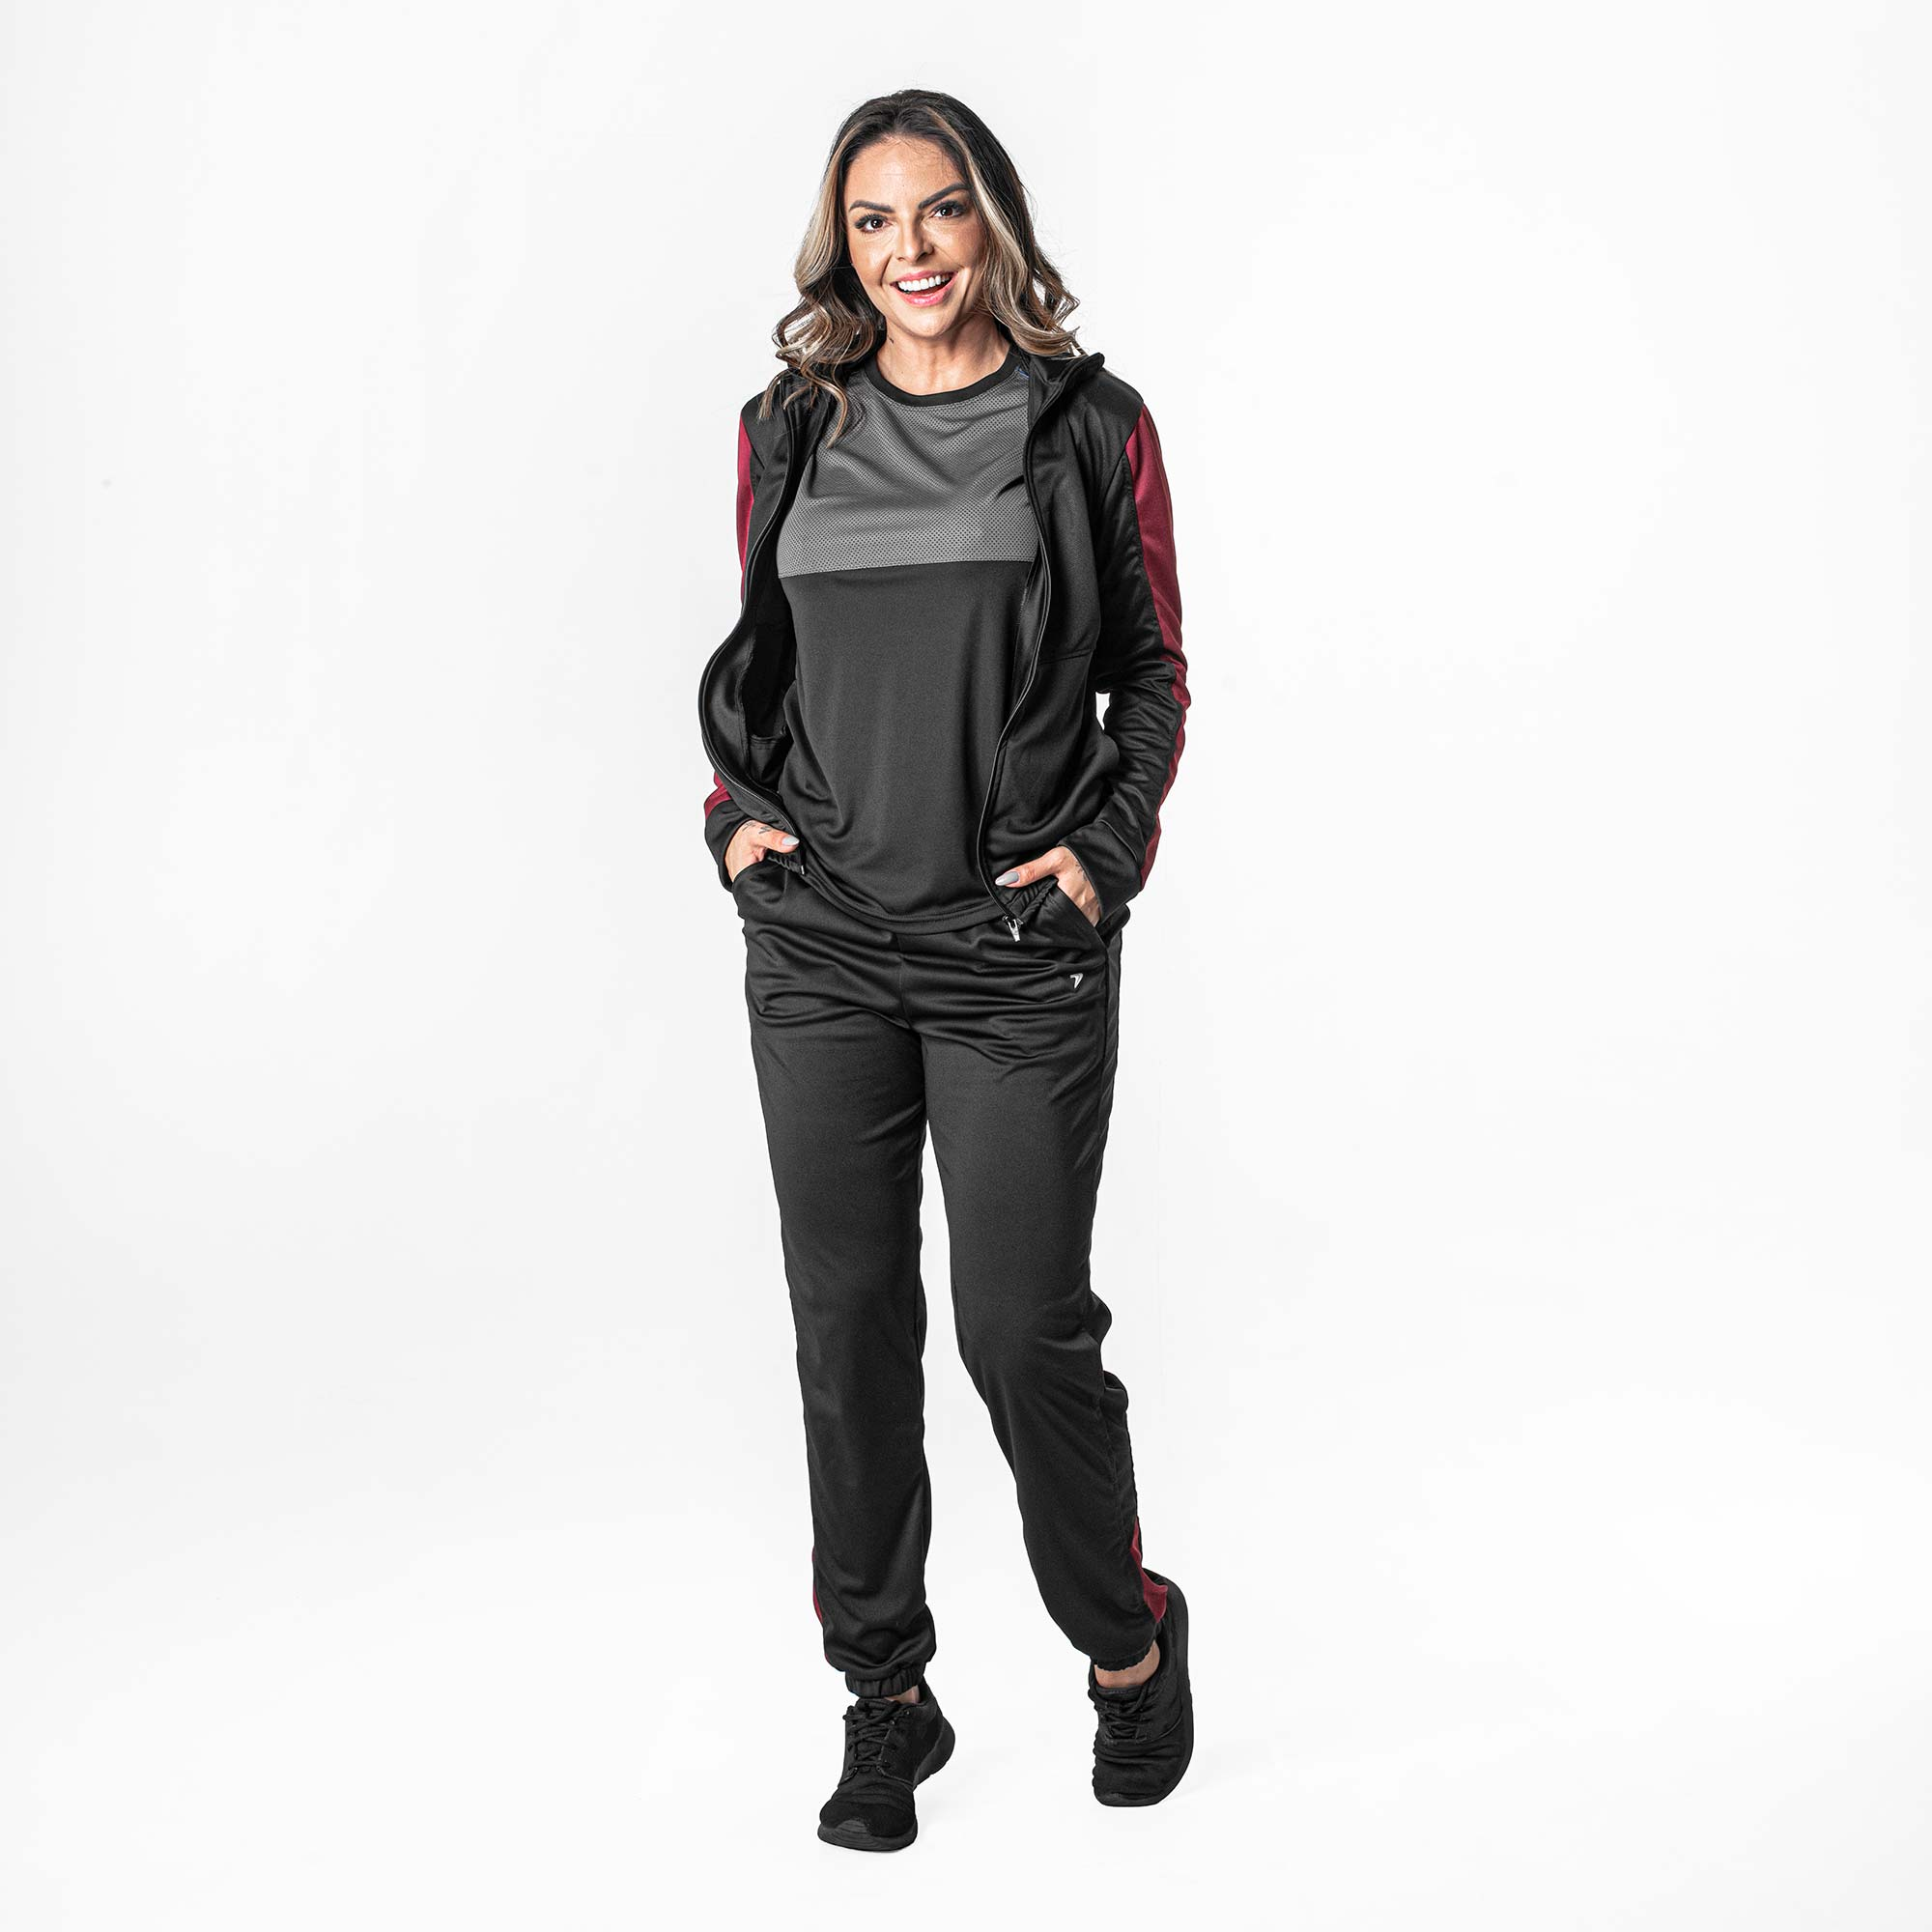 Jaqueta Esportiva Feminina Change 12142